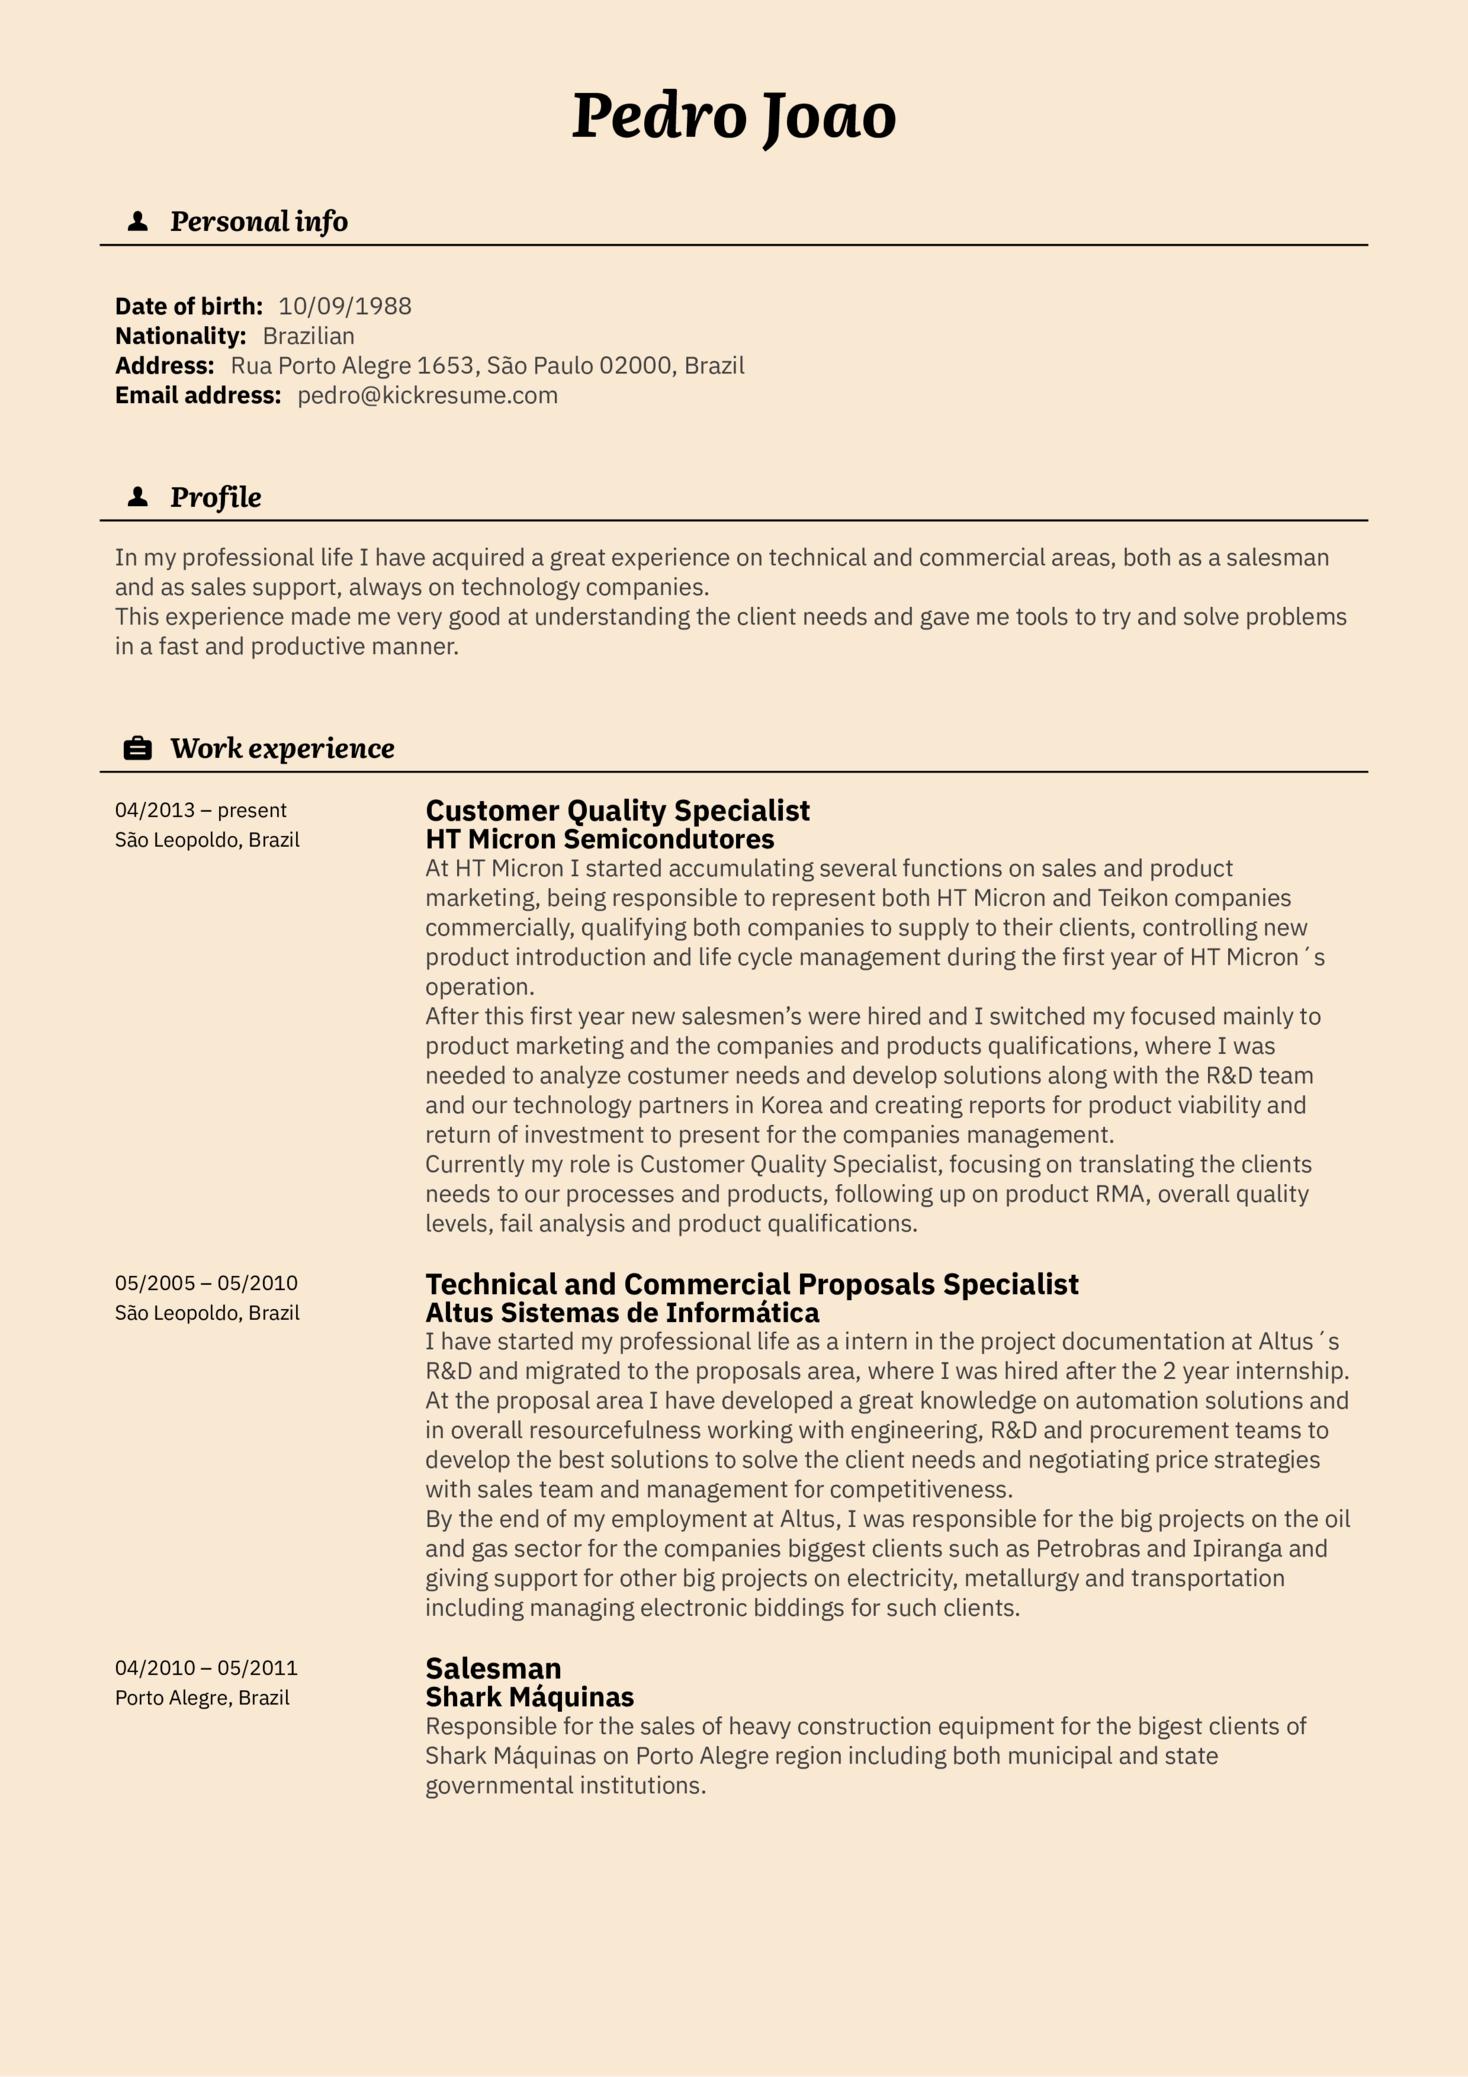 Vodafone Customer Specialist Resume Example (Part 1)